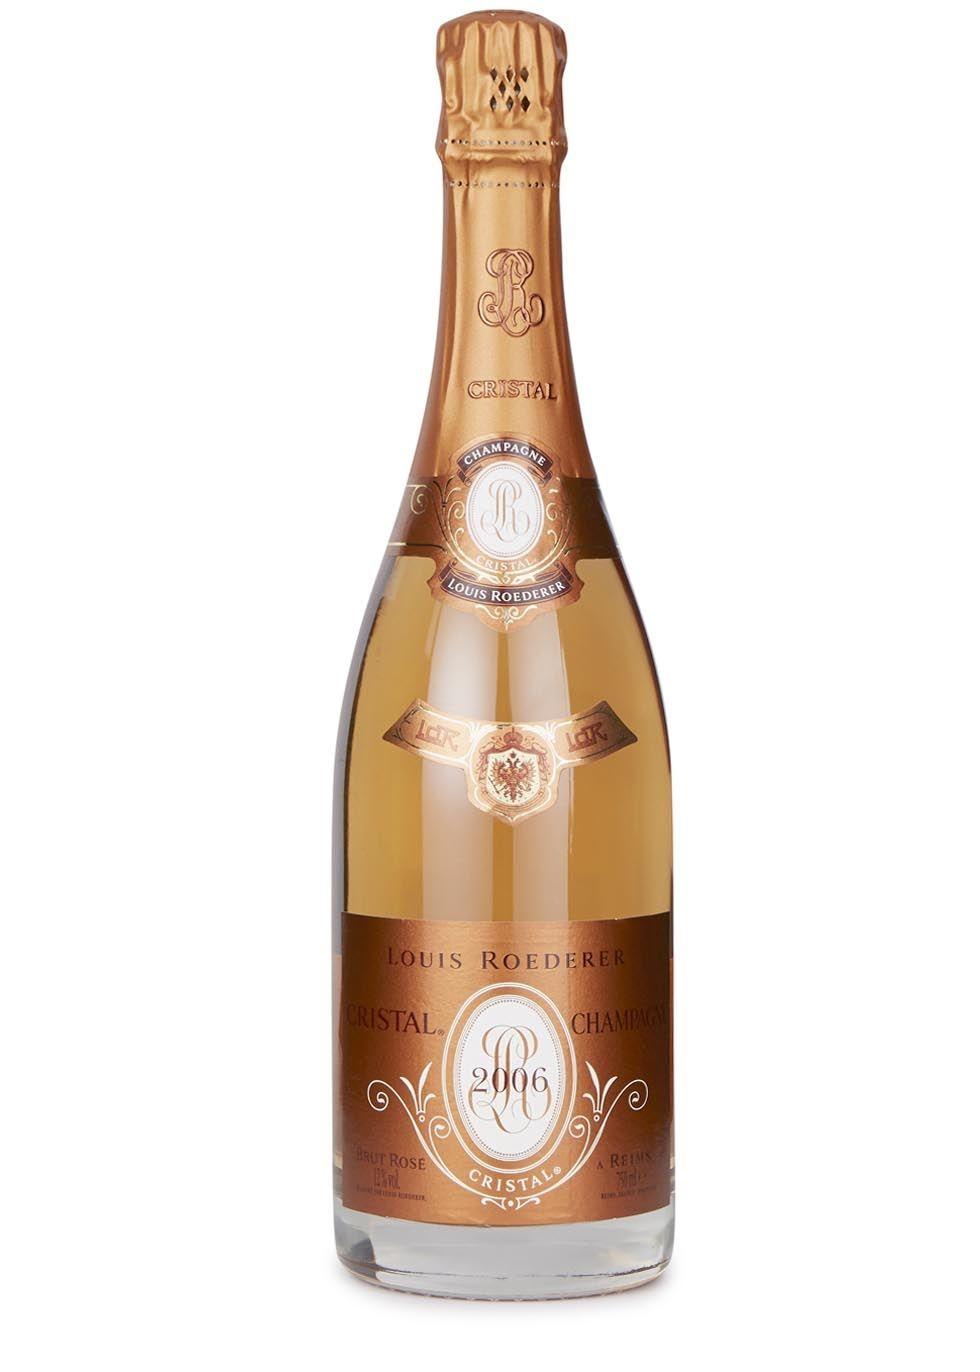 Cristal Rose 06 In 2020 Champagne Bottle Rose Champagne